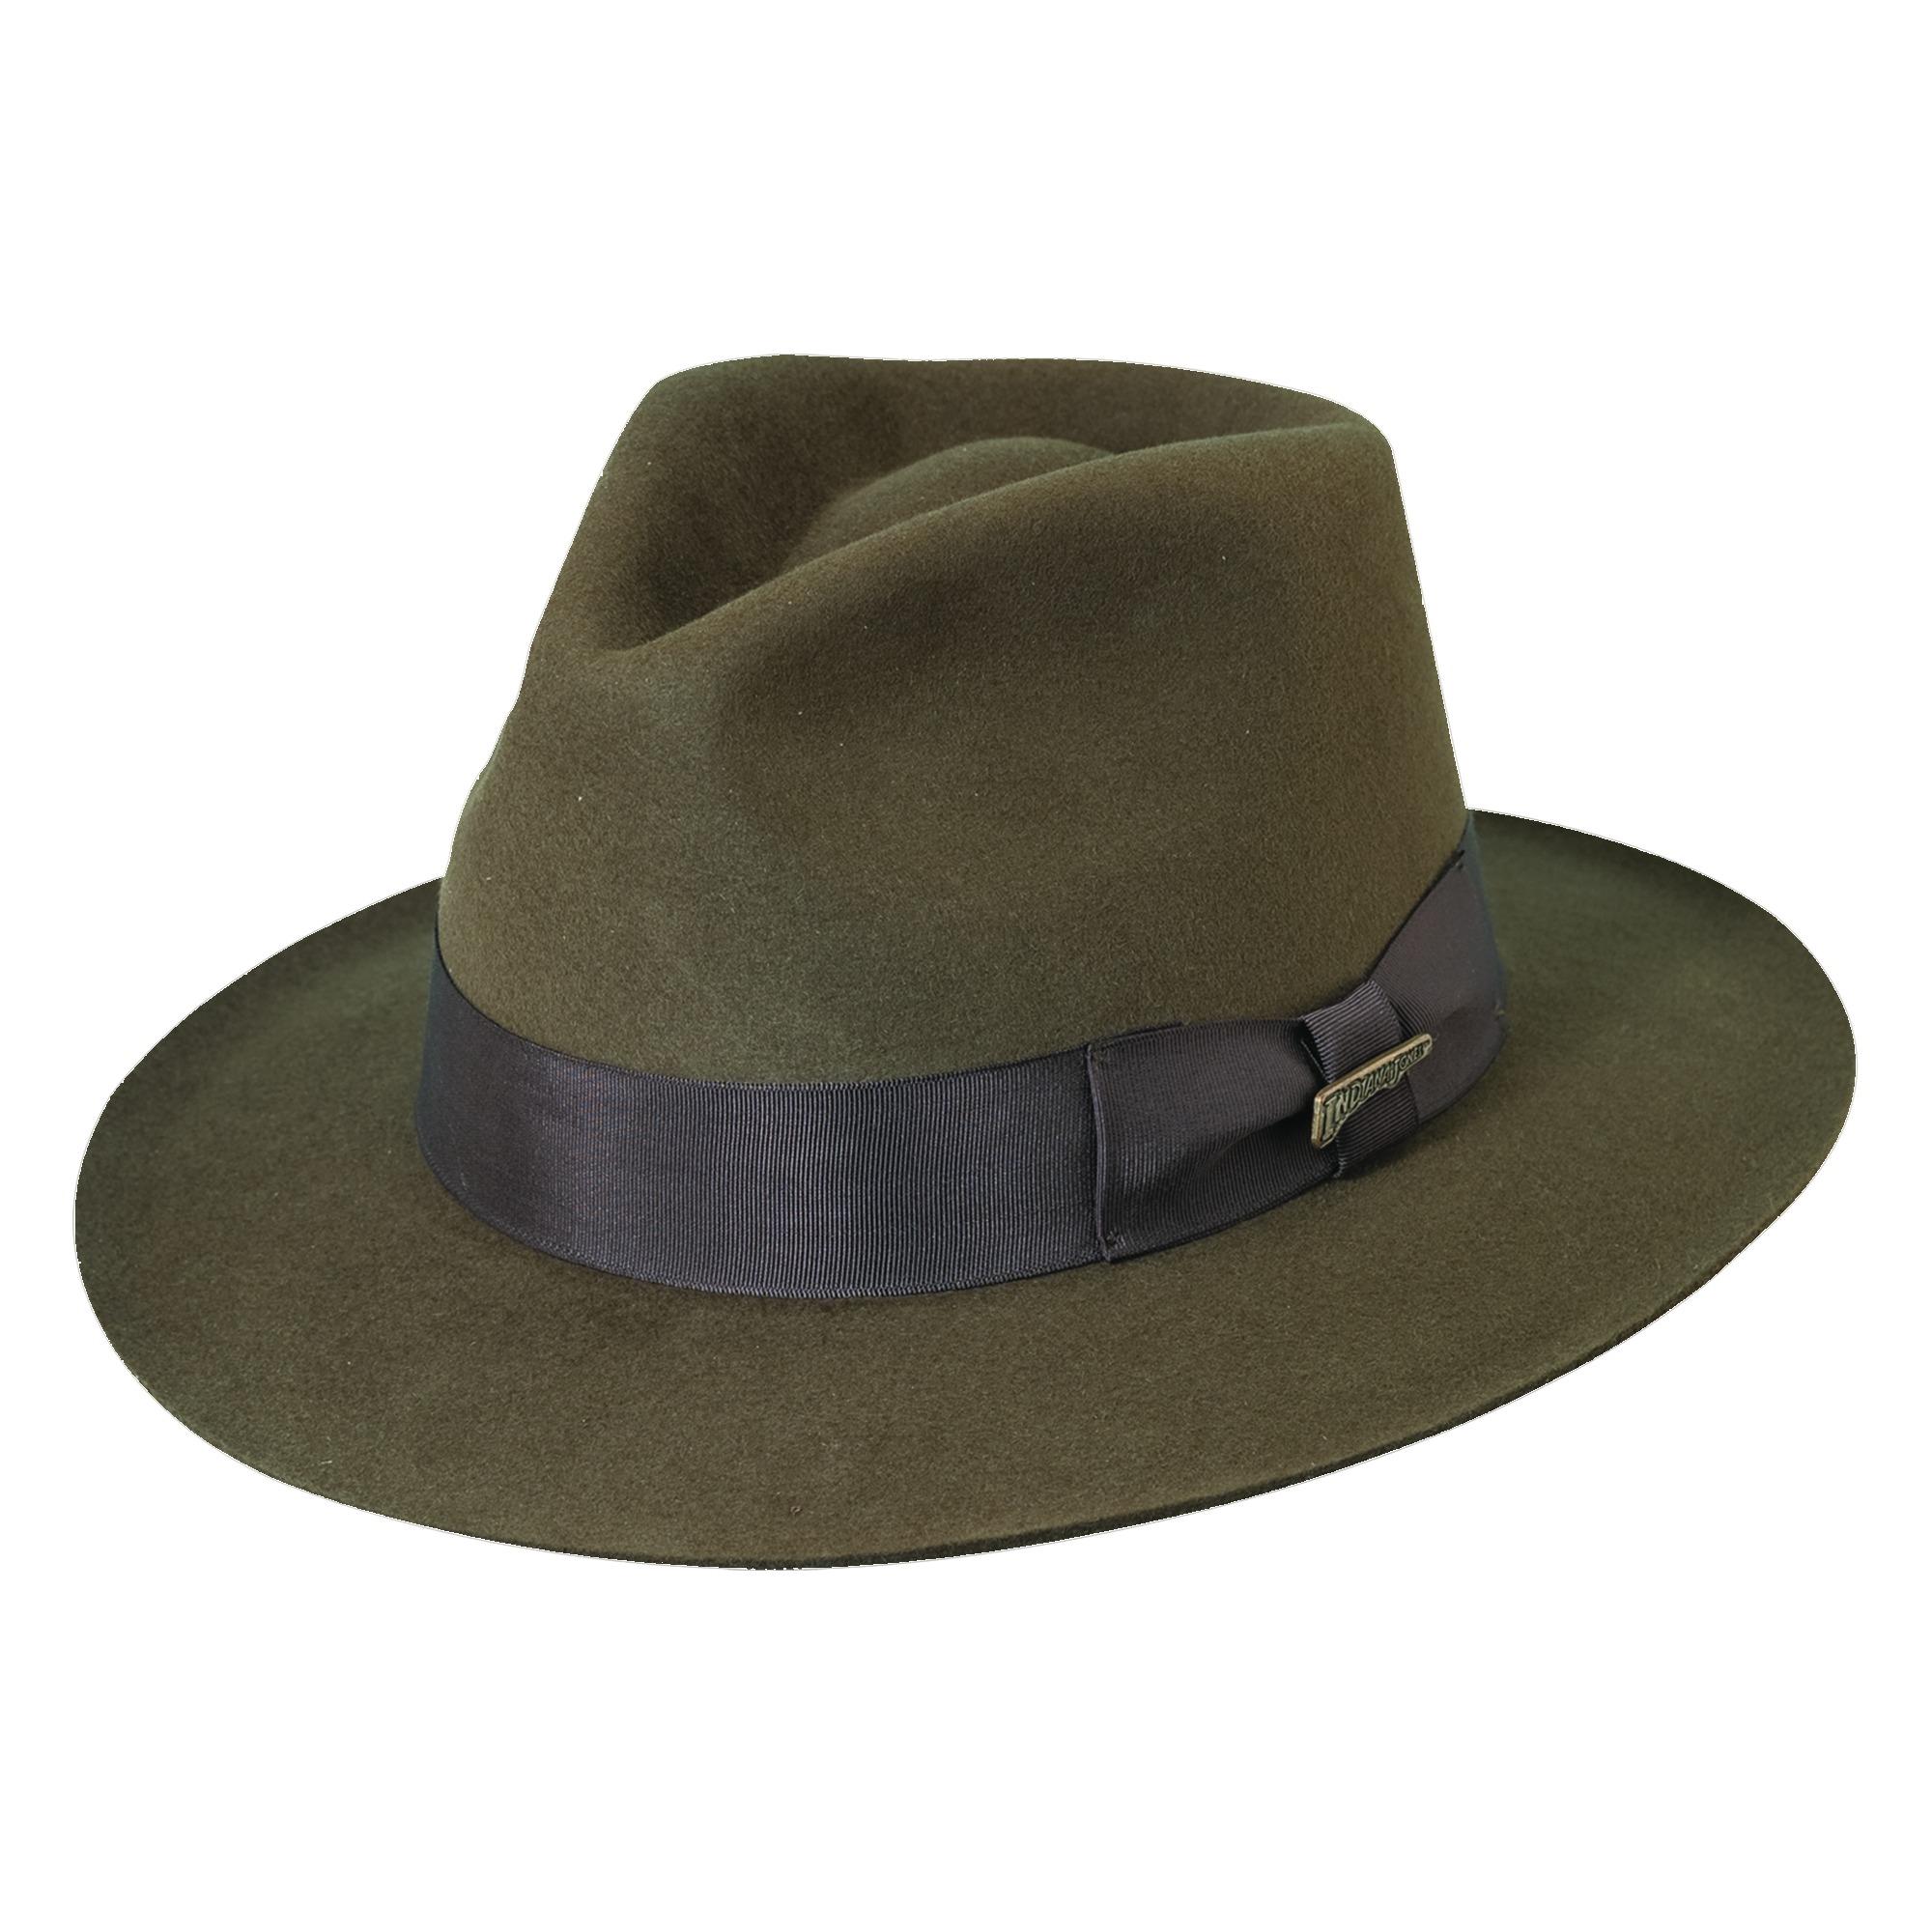 Dorfman Pacific Men's Fur Felt Indiana Jones 2.5 Inch Bri...